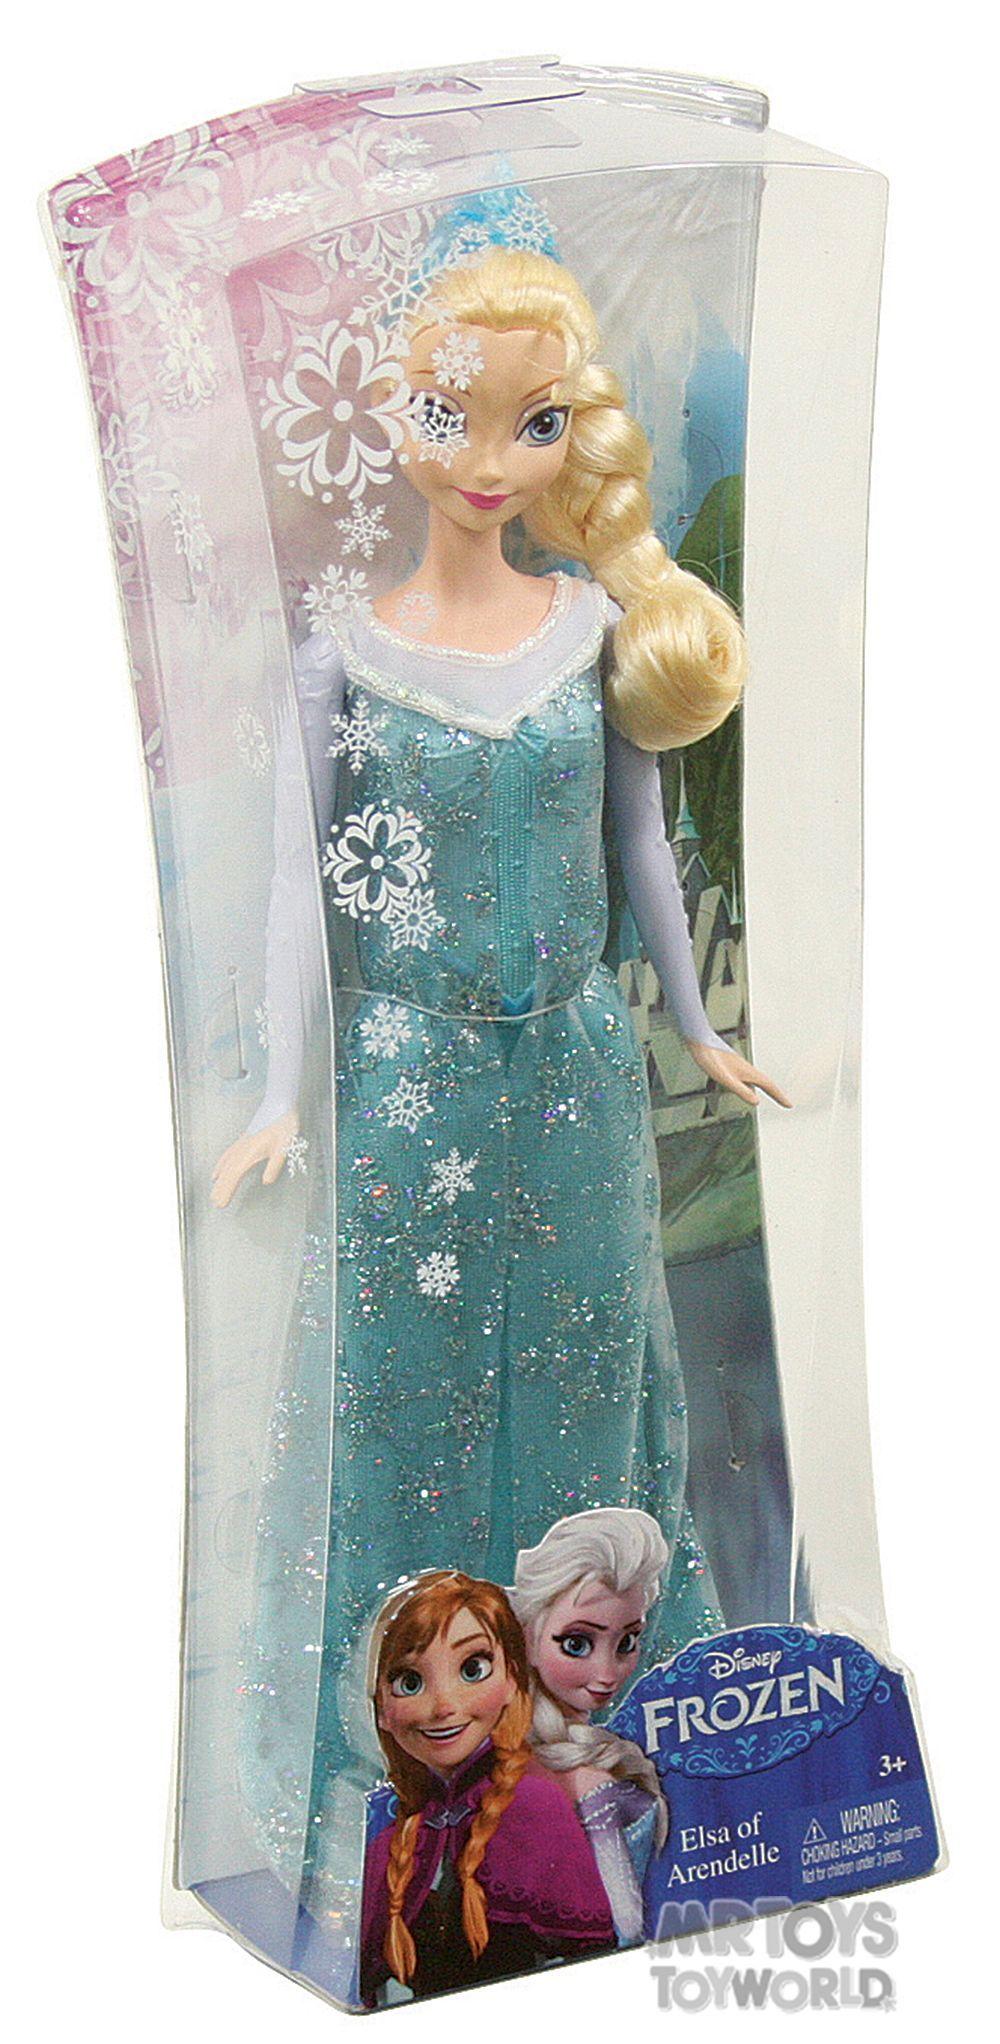 Disney frozen elsa of arendelle 3999 disney frozen